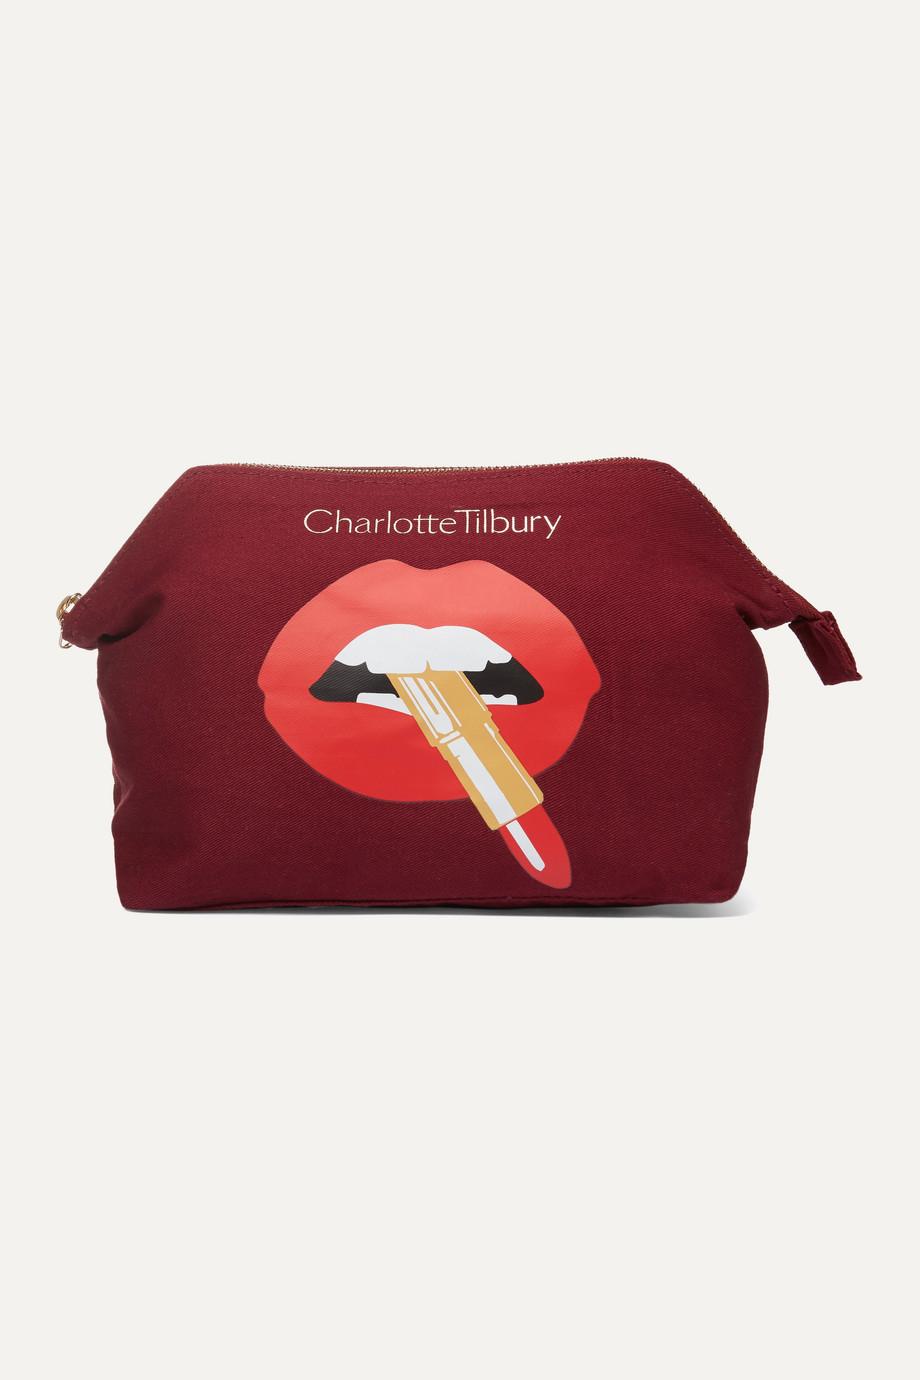 Charlotte Tilbury Hot Lips Kosmetiktasche aus bedrucktem Baumwoll-Canvas